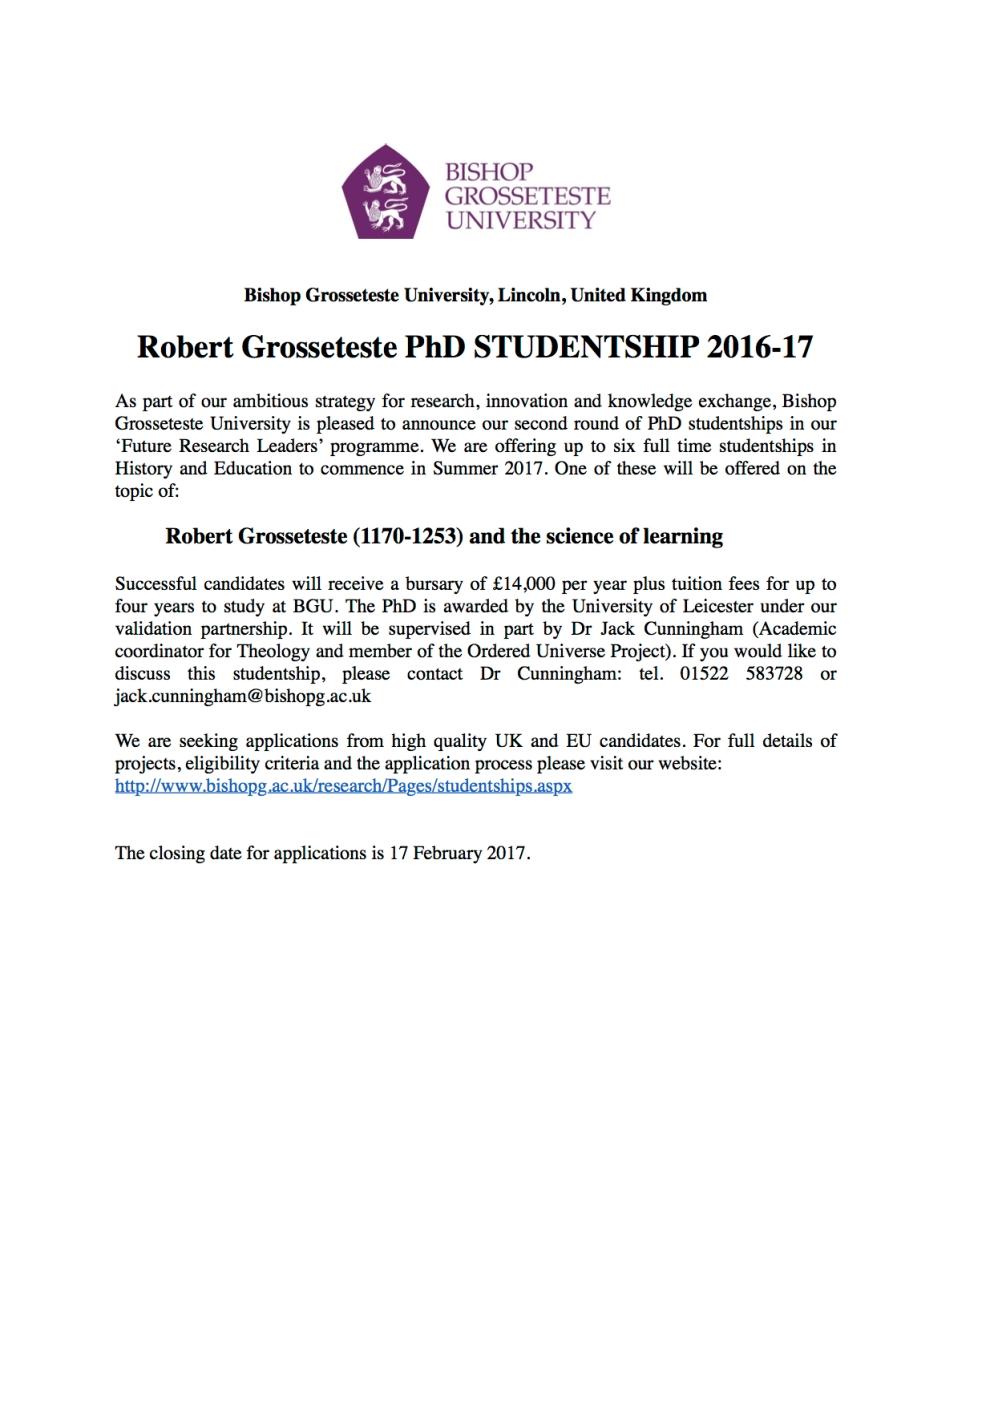 advert-studentships-2016-17